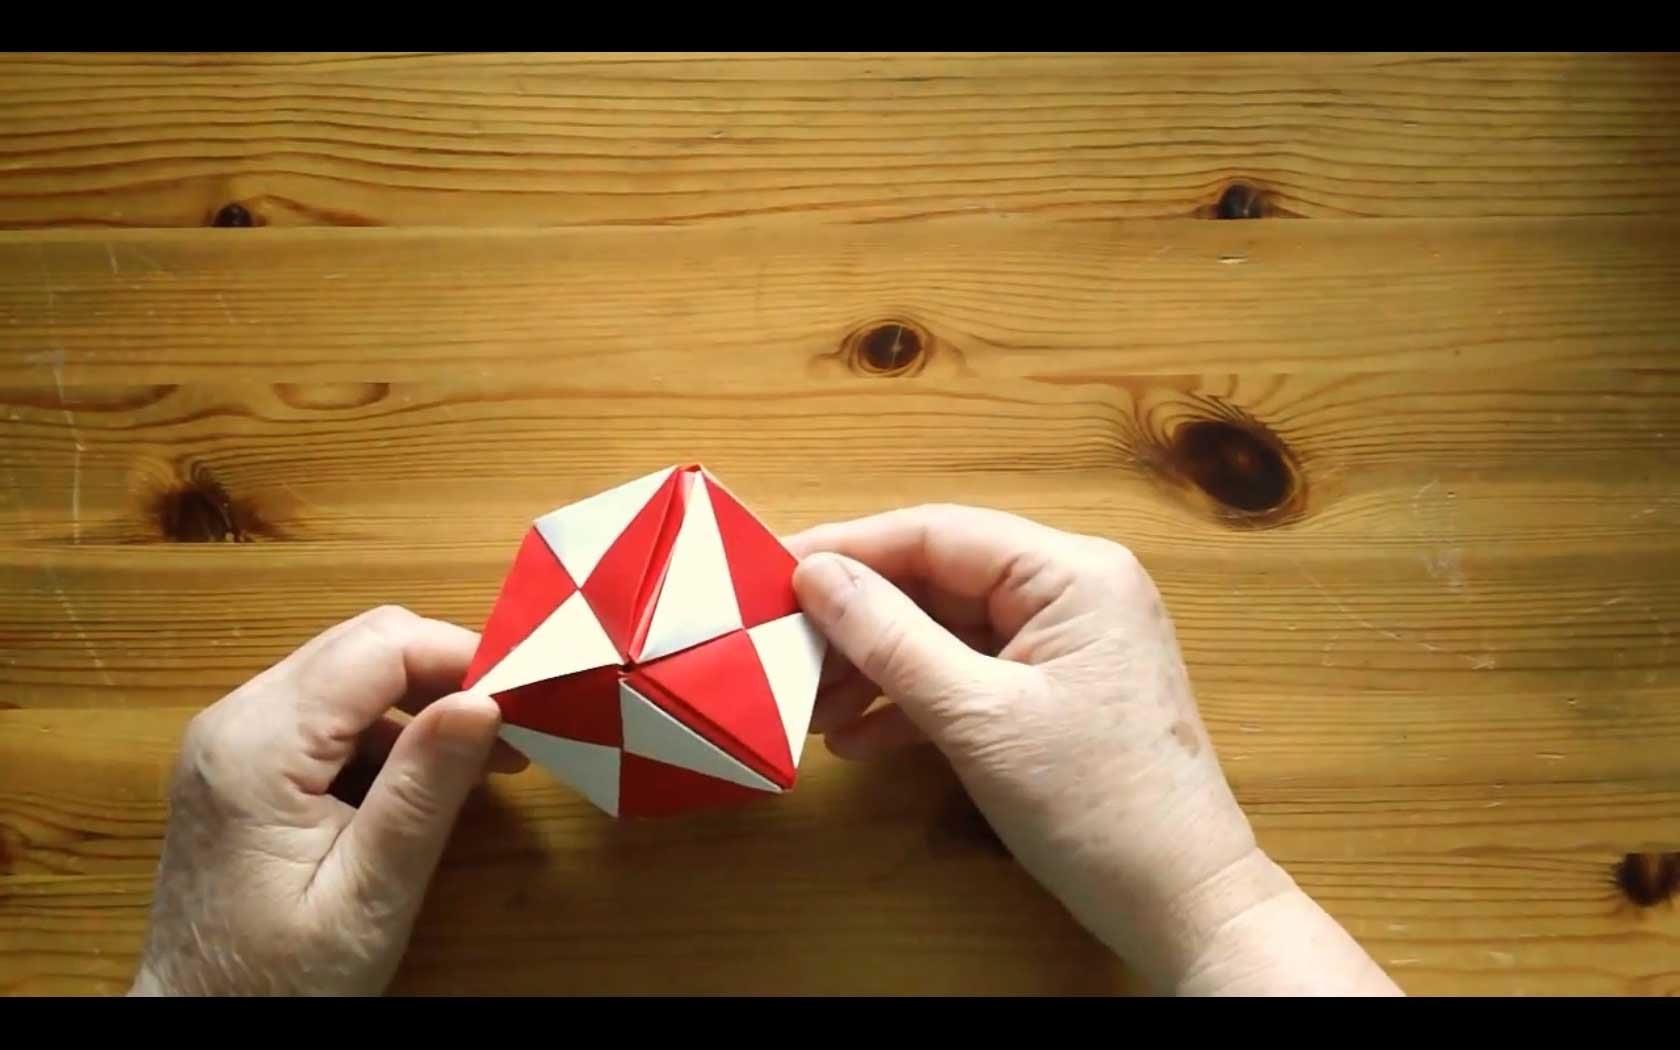 How To Fold an Origami Cube - Falte Dir einen Origami Würfel!